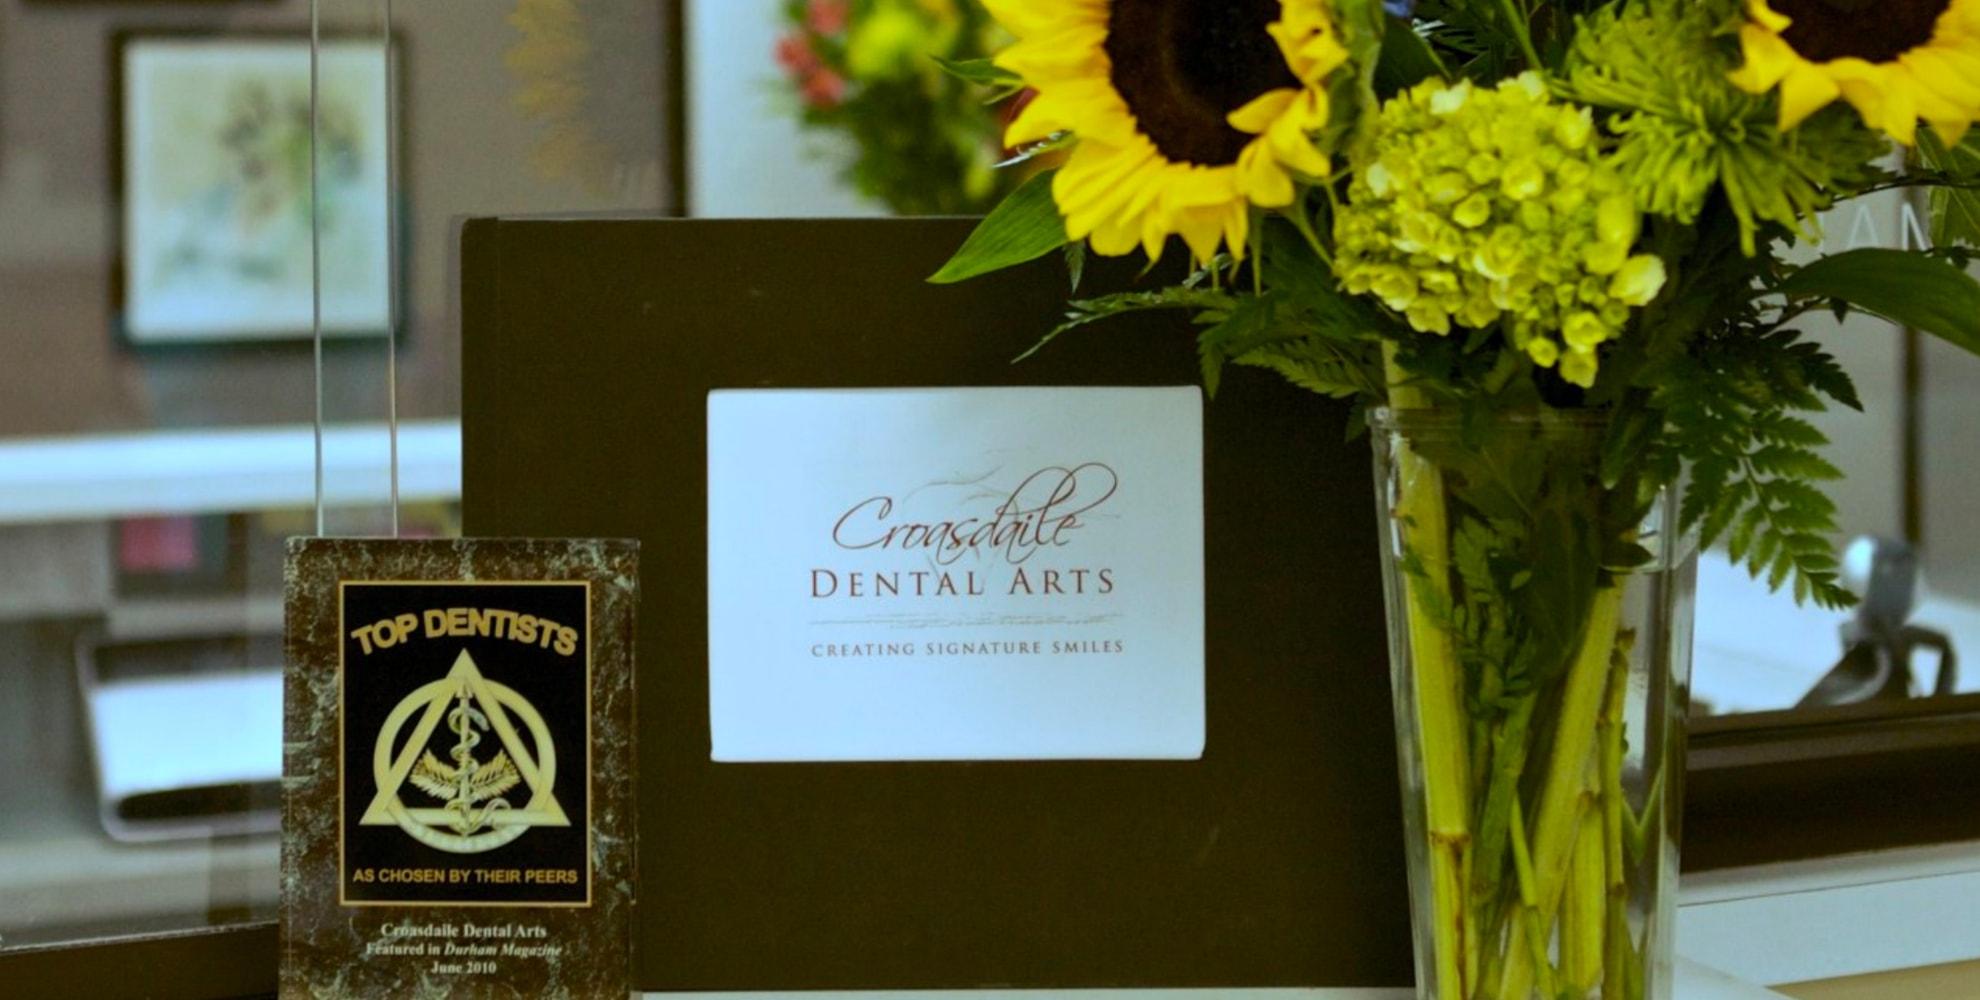 Croasdaile Dental Arts Top Dentist Award